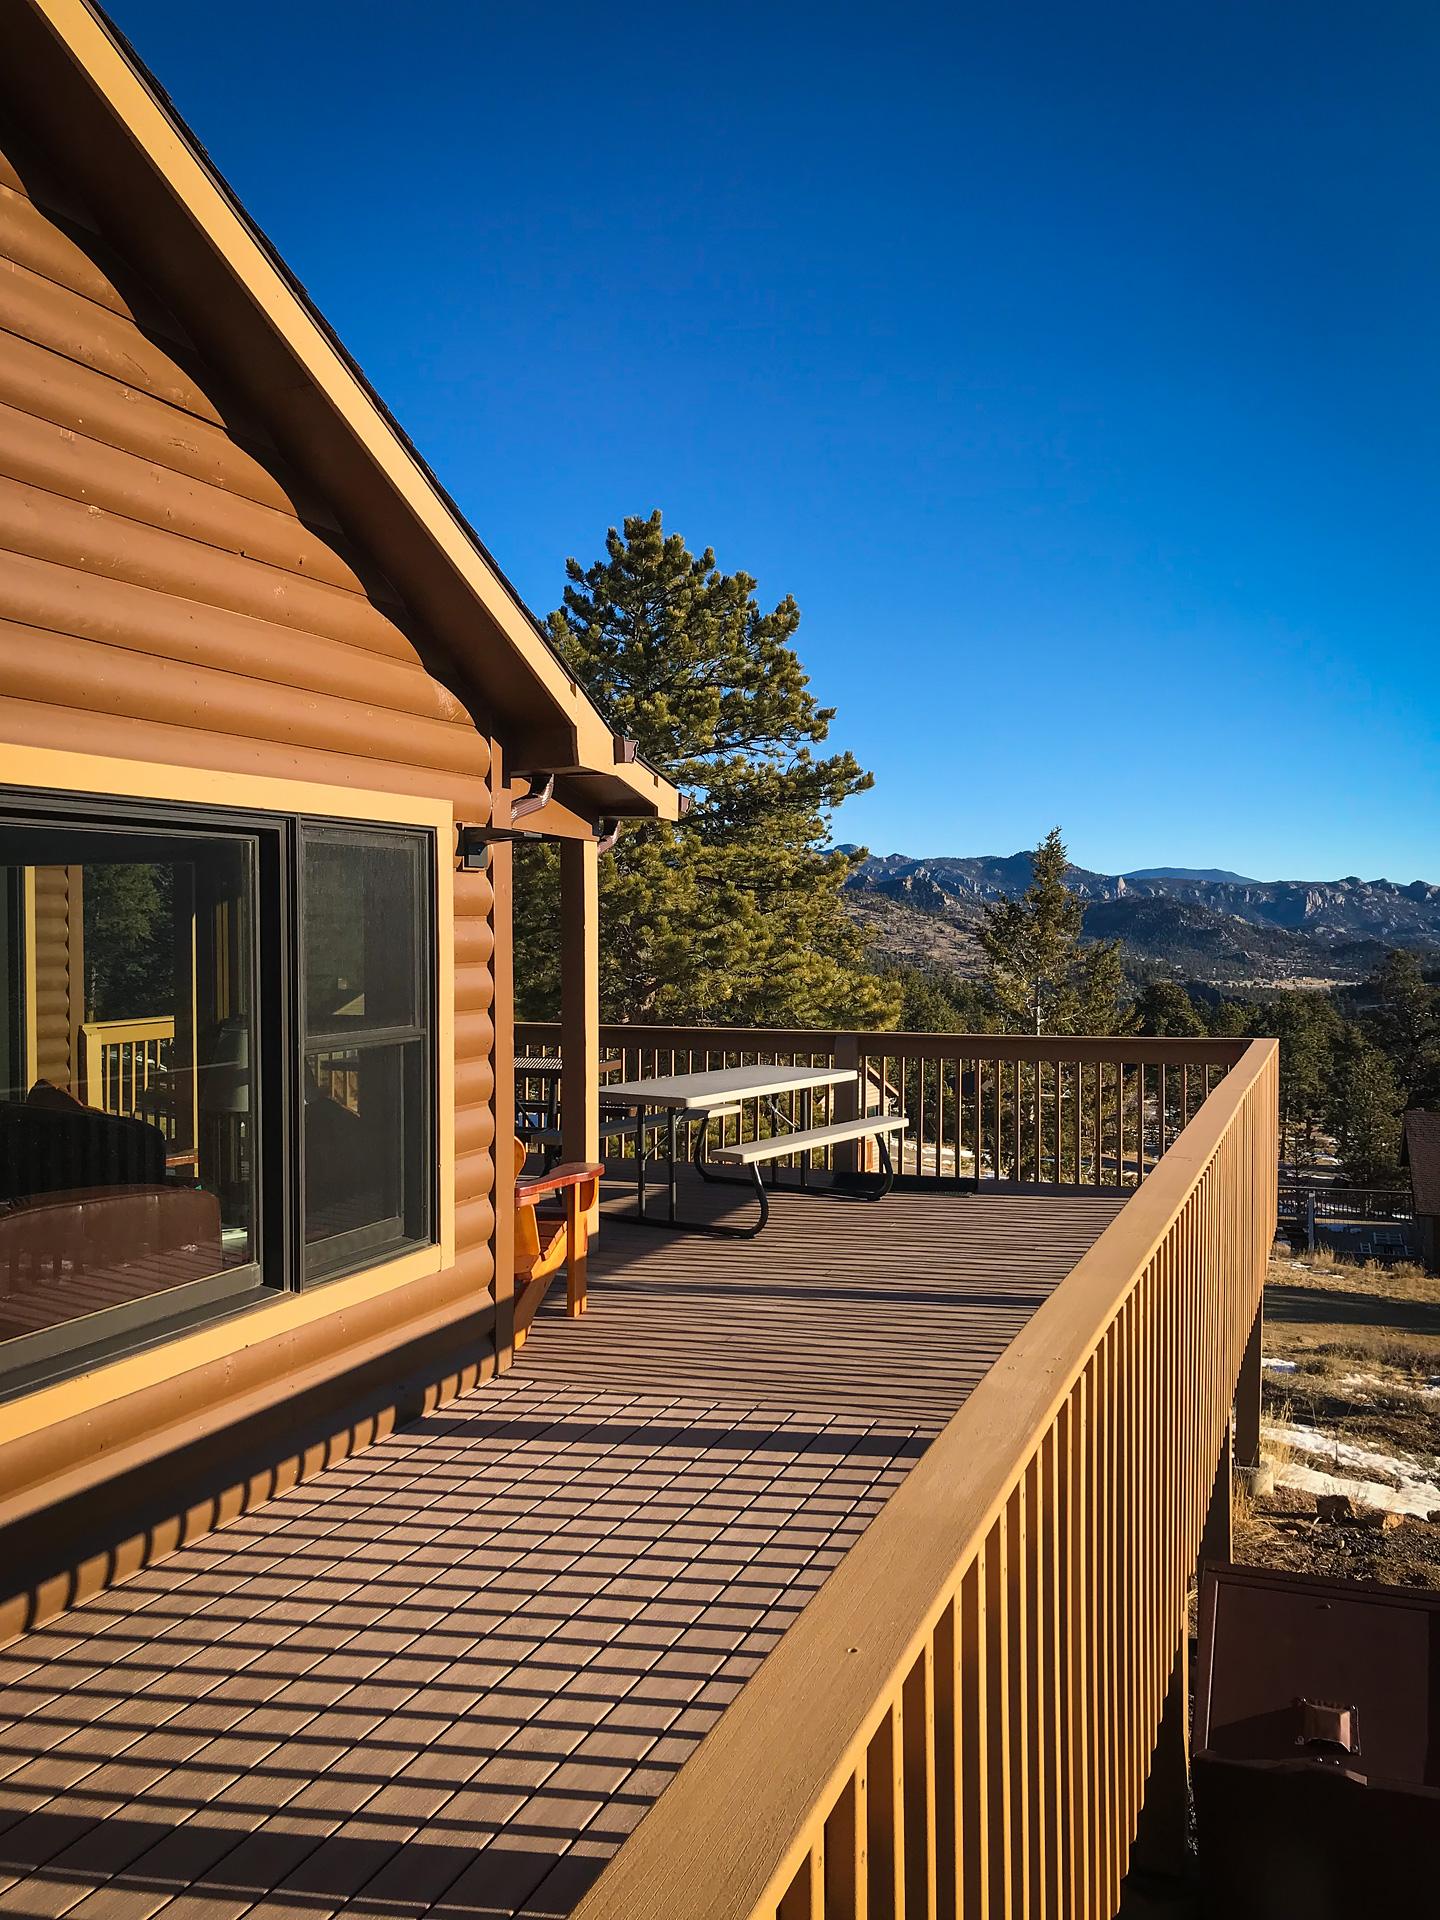 YMCA Estes Park - Near Rocky Mountain National Park